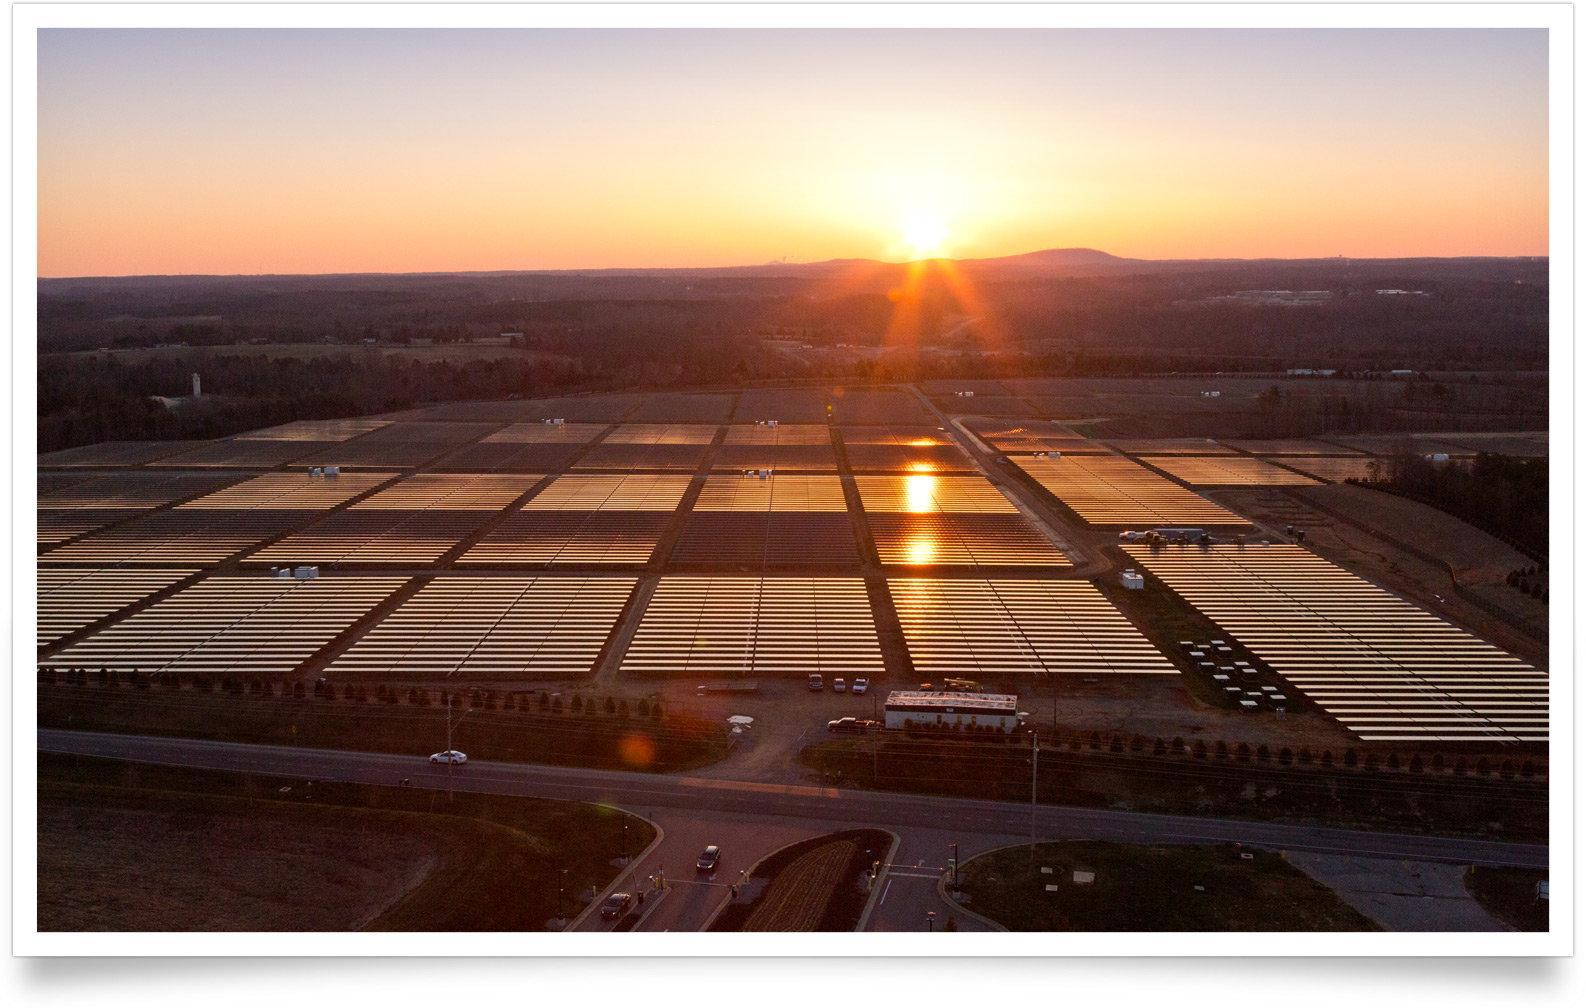 Apples Solarfarm in Maiden